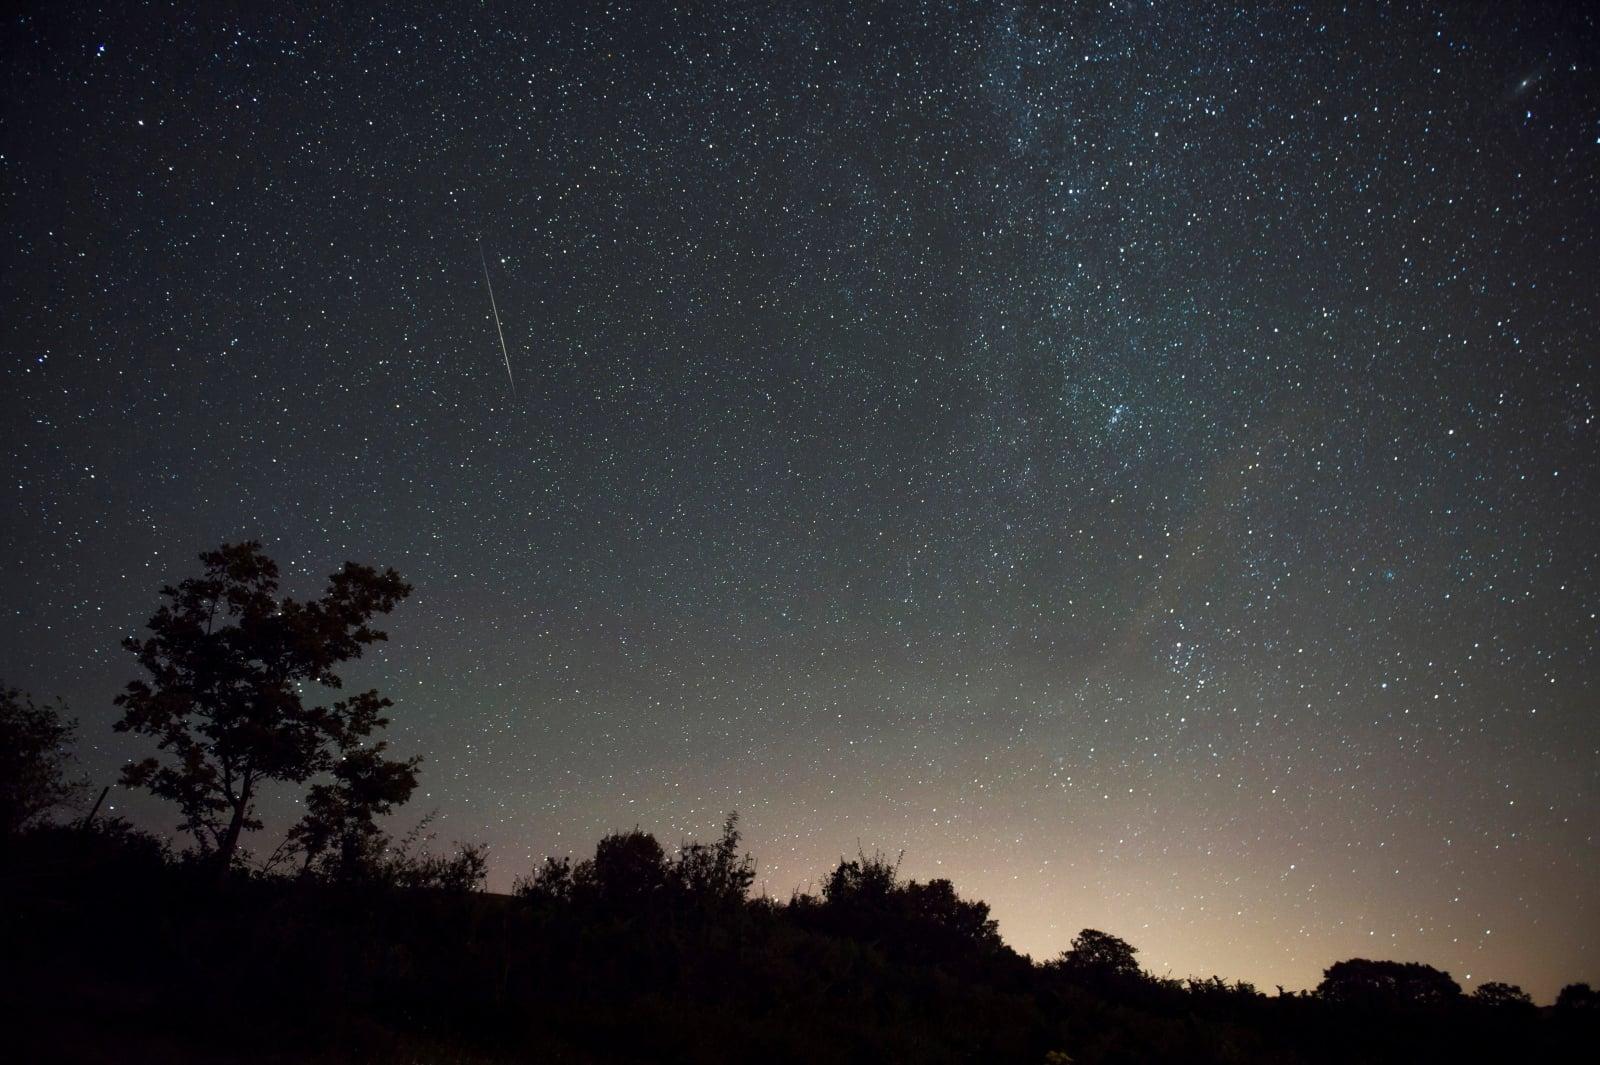 Deszcz meteorów fot. EPA/PEDRO PUENTE HOYOS